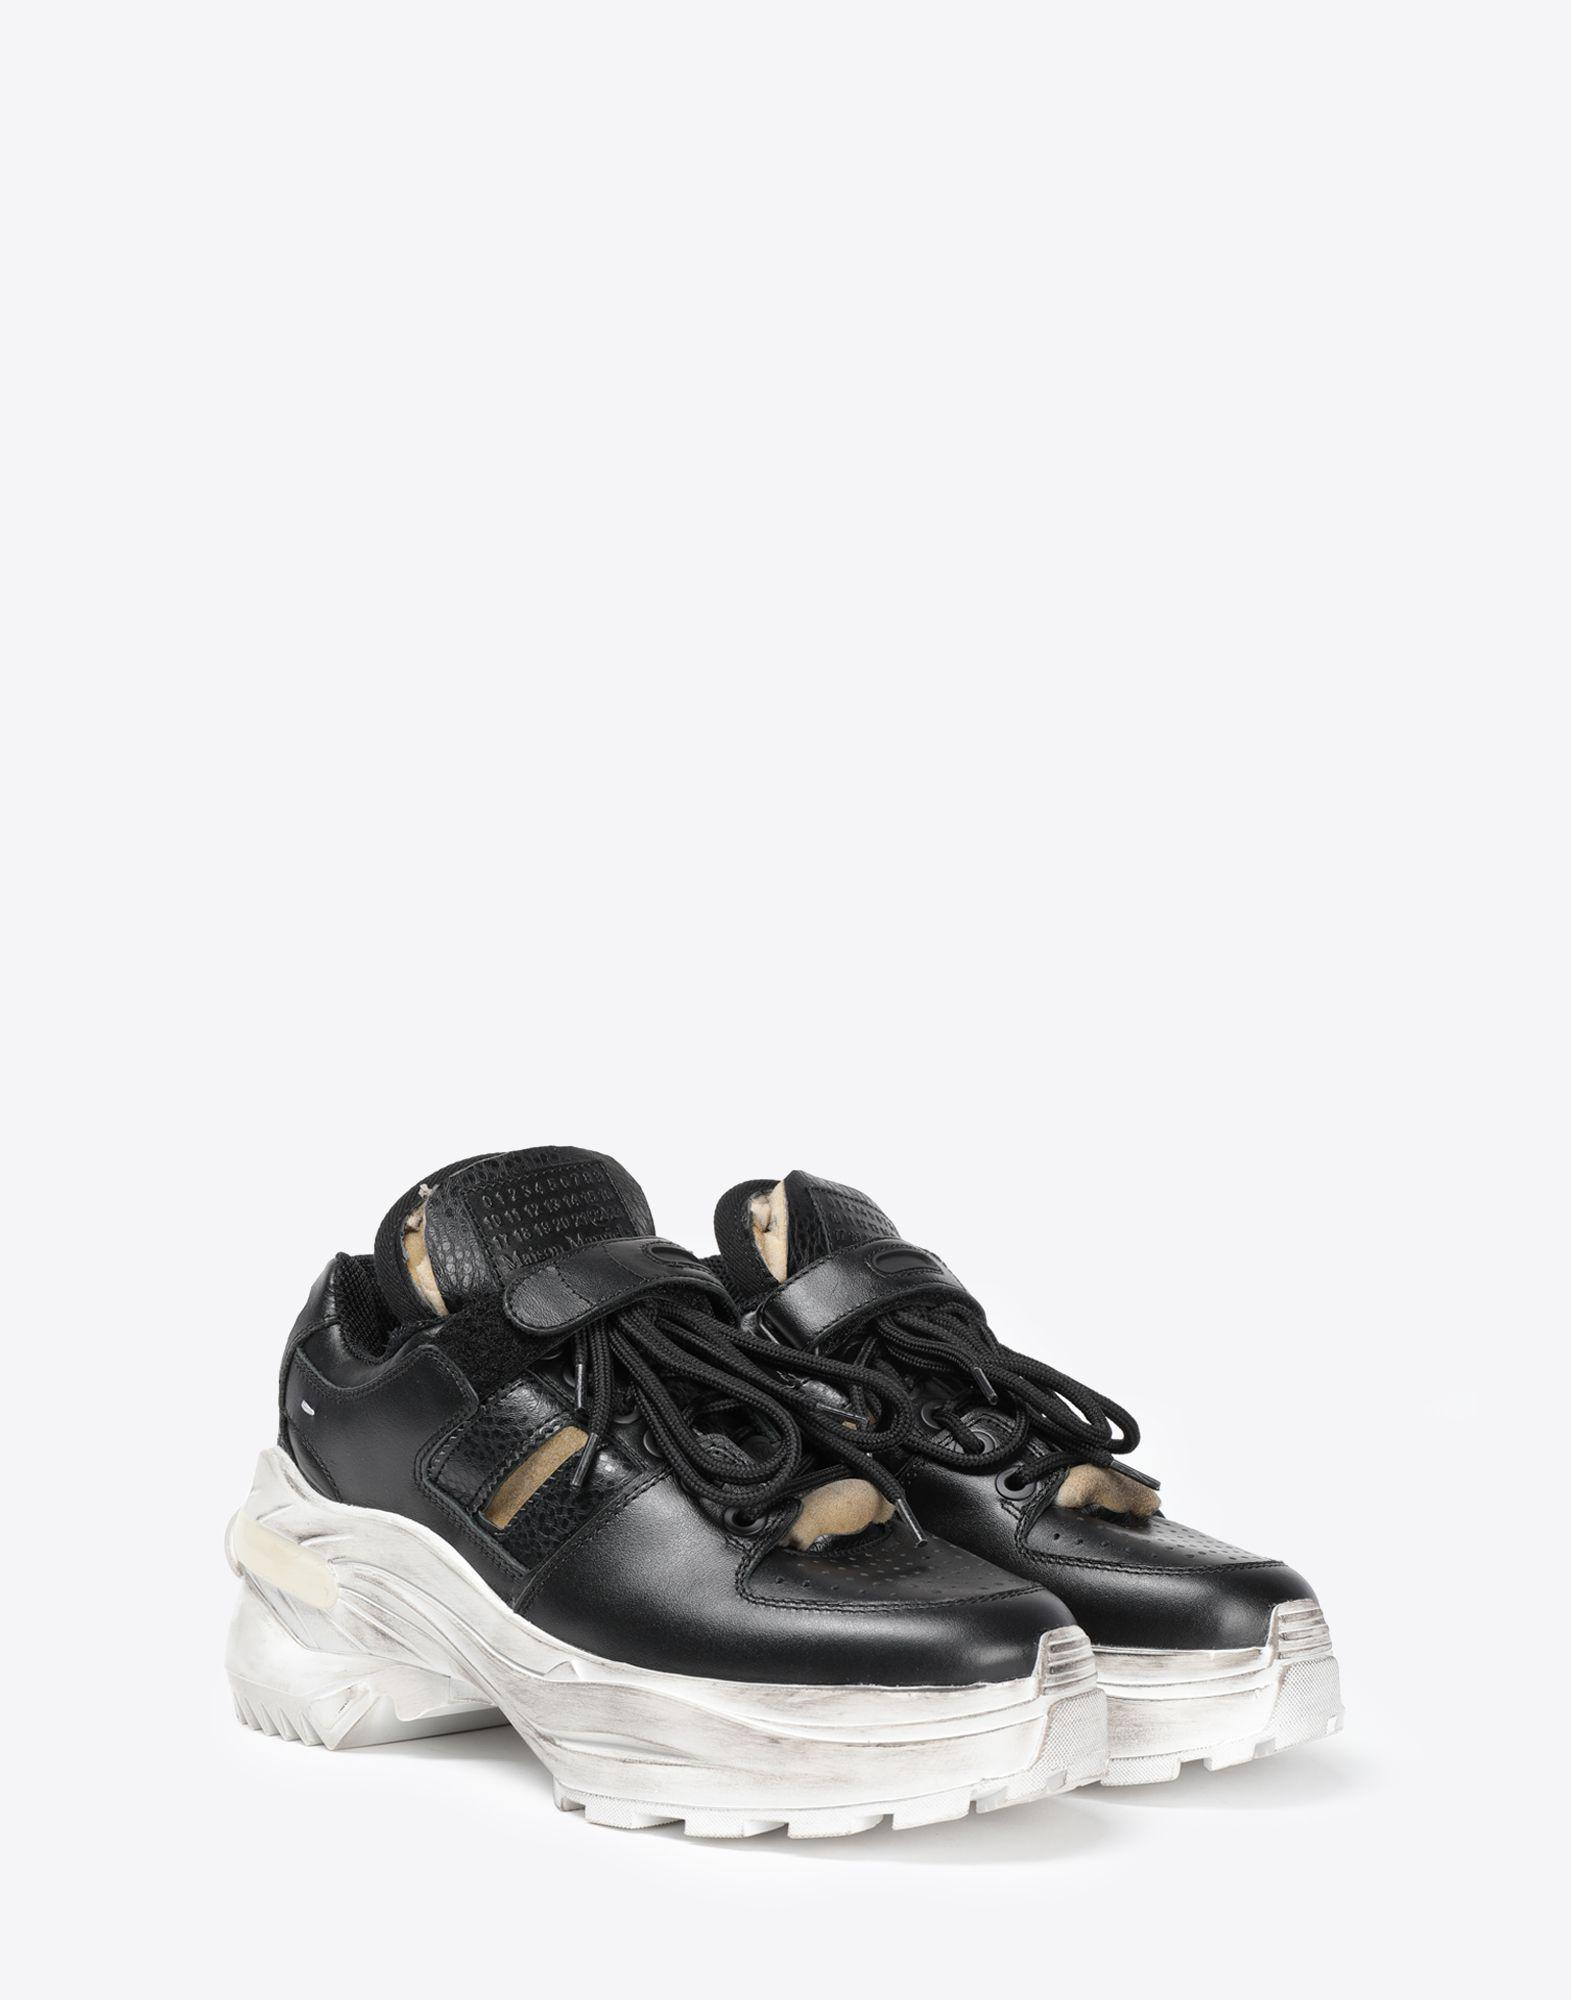 Black Maison Save Top Artisanal Margiela 15 In Lyst Sneakers Low Owq0OCd